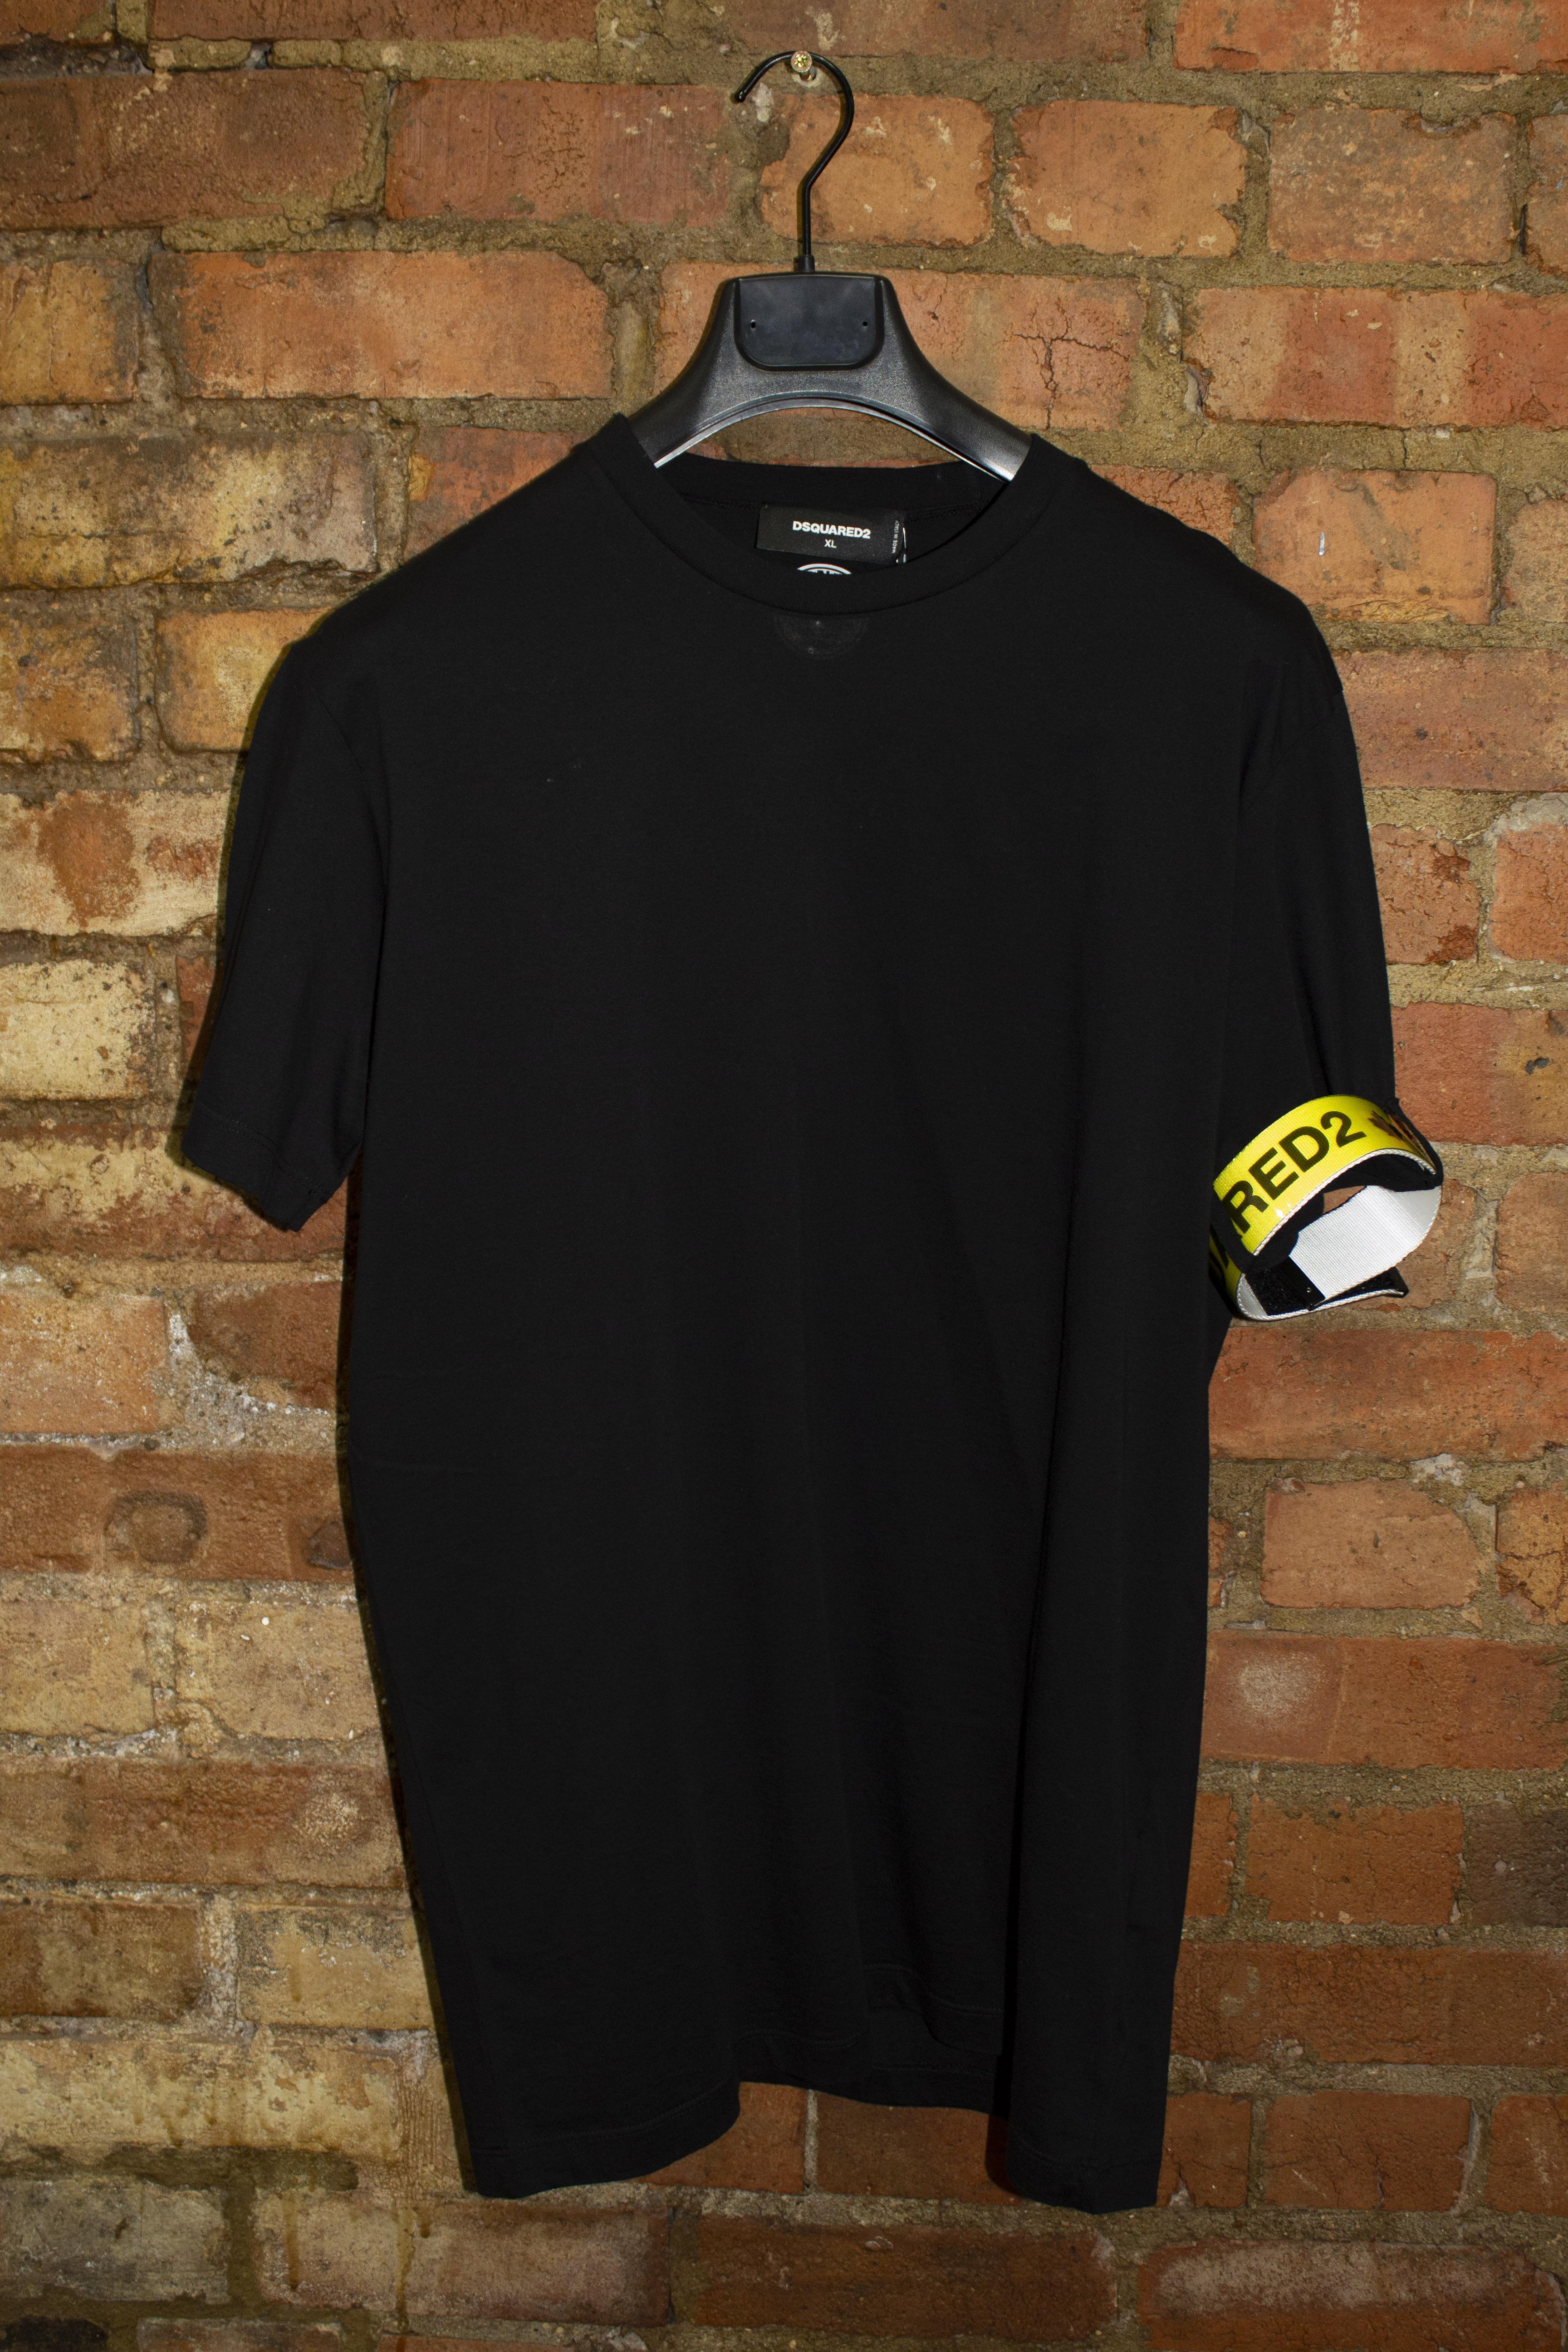 Armband T-shirt